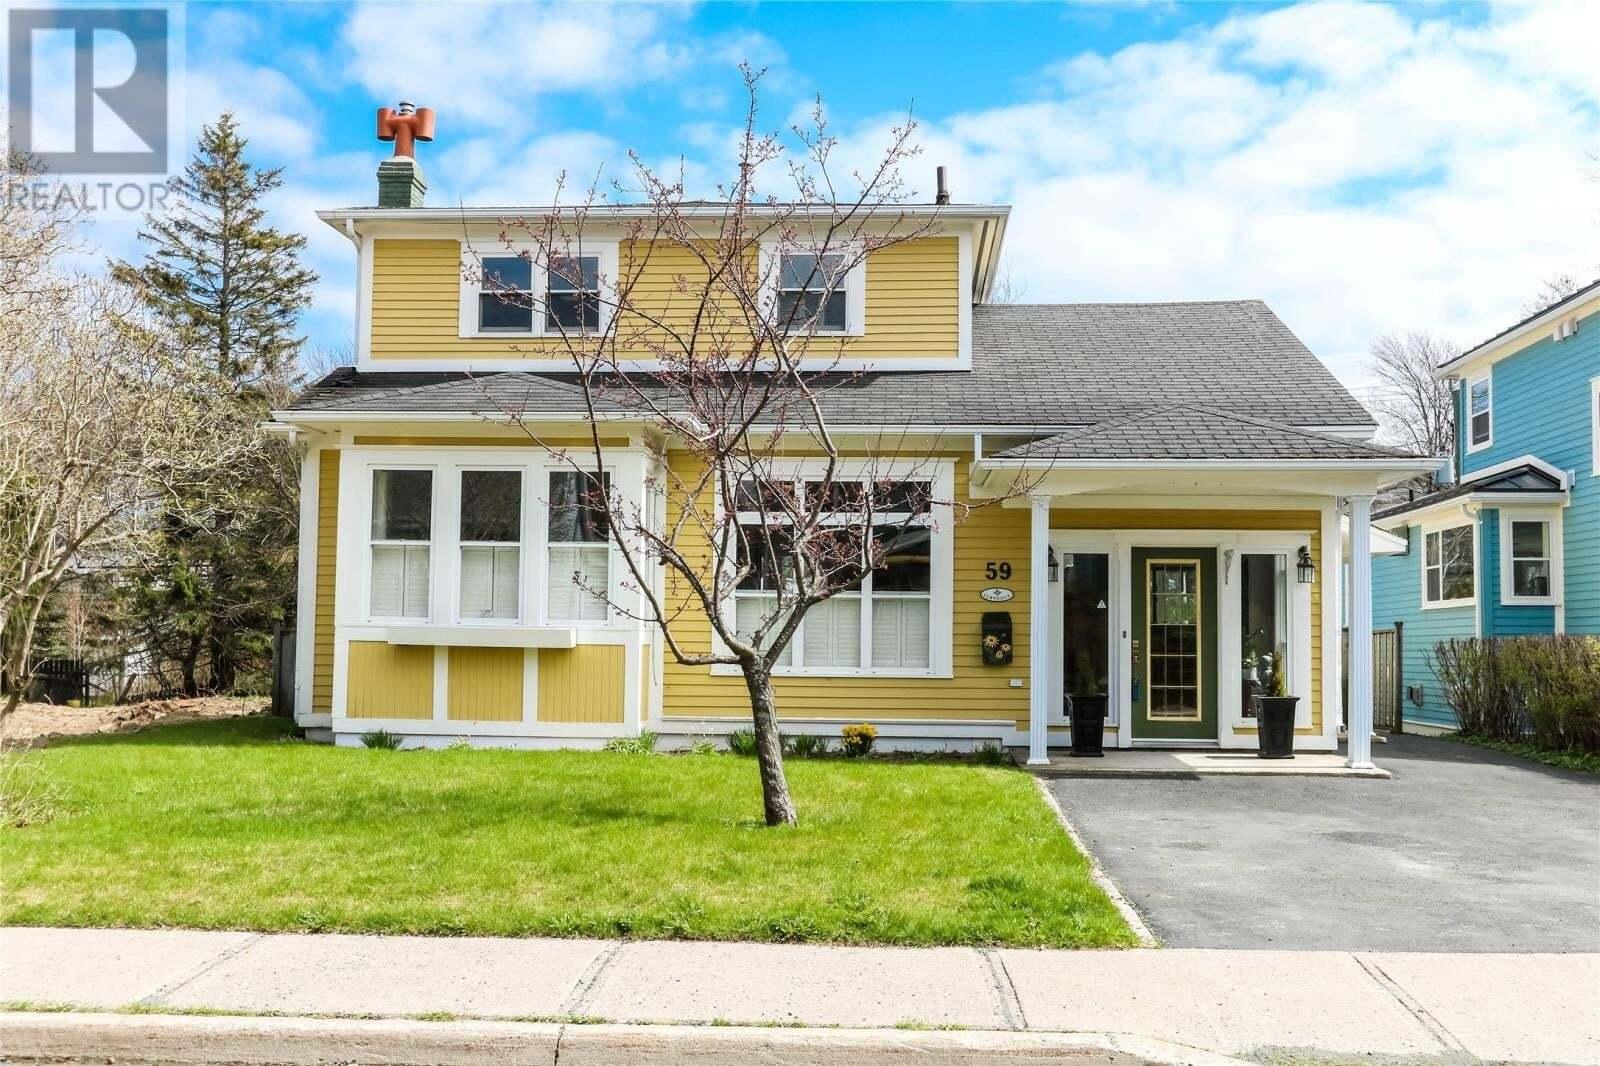 House for sale at 59 Poplar Ave St. John's Newfoundland - MLS: 1214229